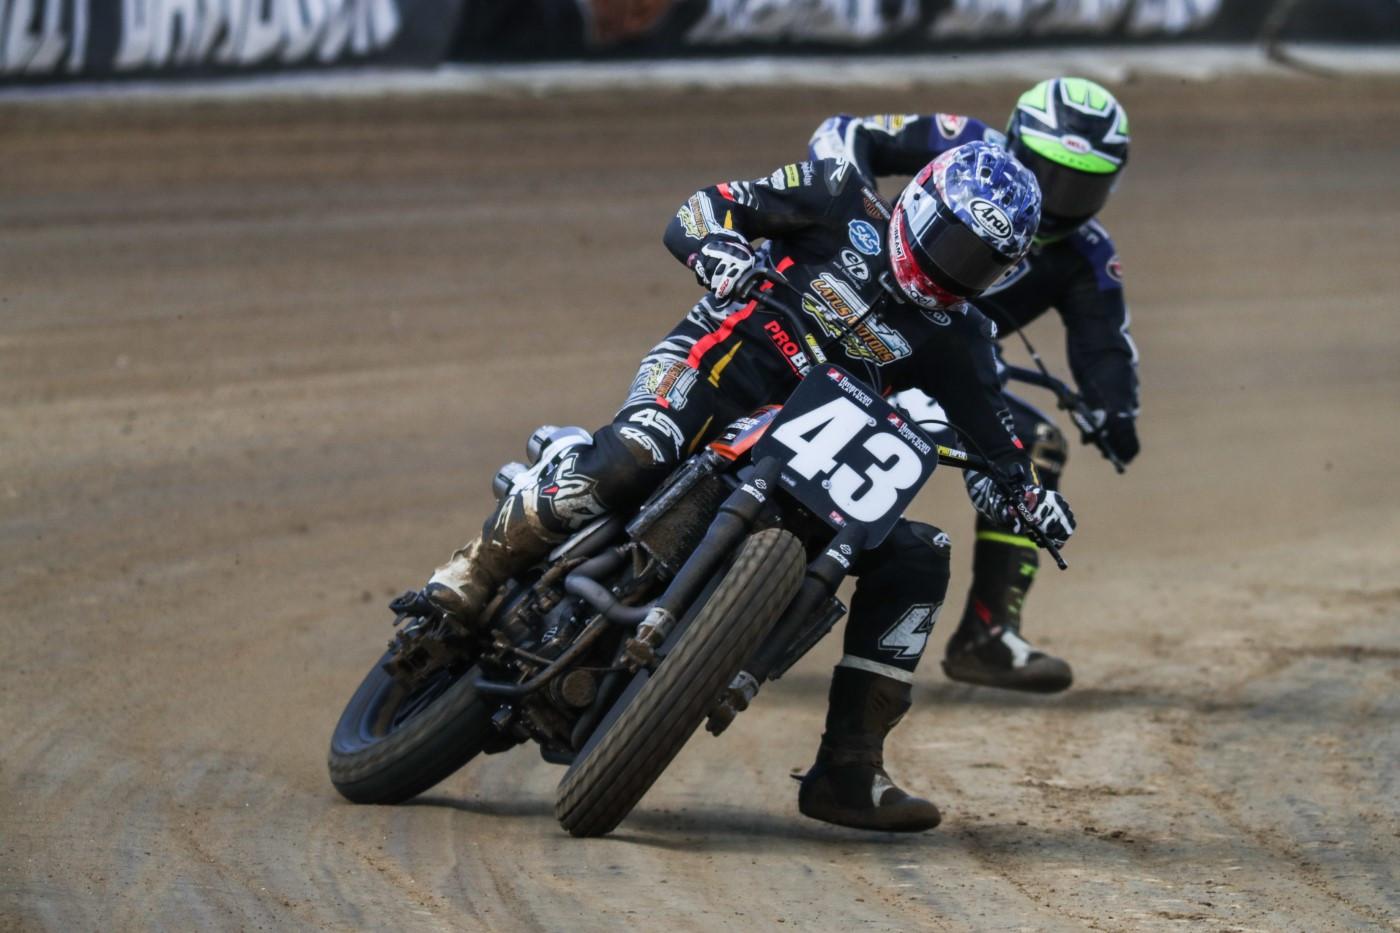 James Rispoli (43). Photo courtesy Harley-Davidson.